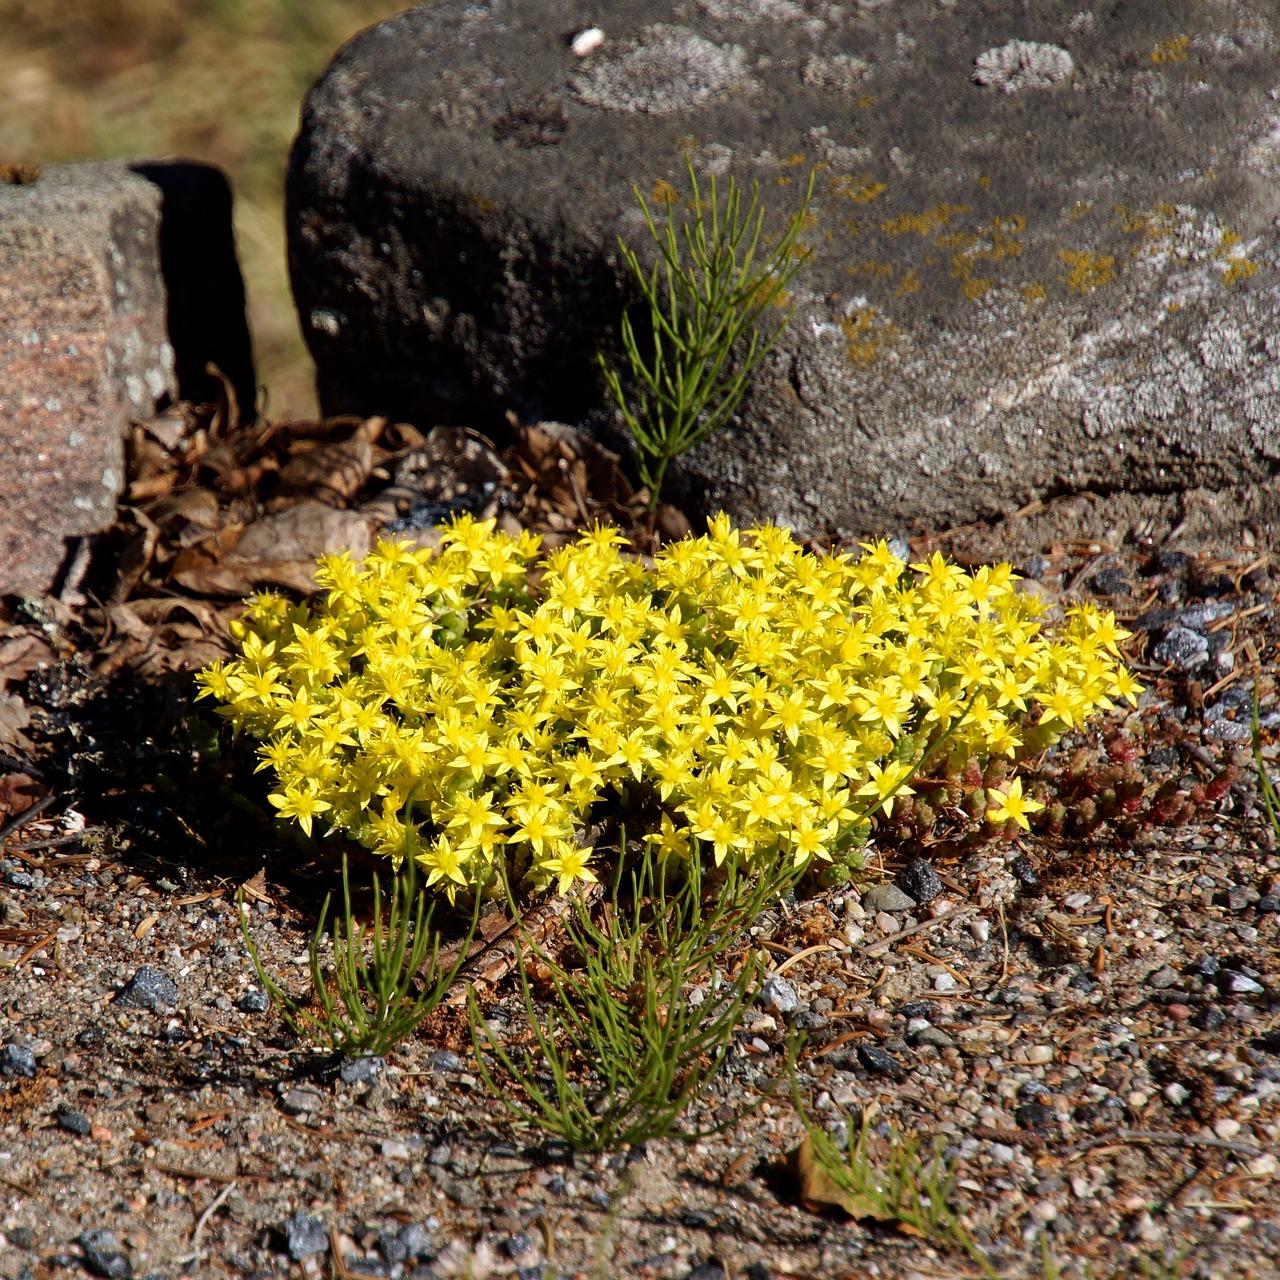 Rock floweryellow tussocksmall yellow flowersin a dry growing rock flower yellow tussock small yellow flowers mightylinksfo